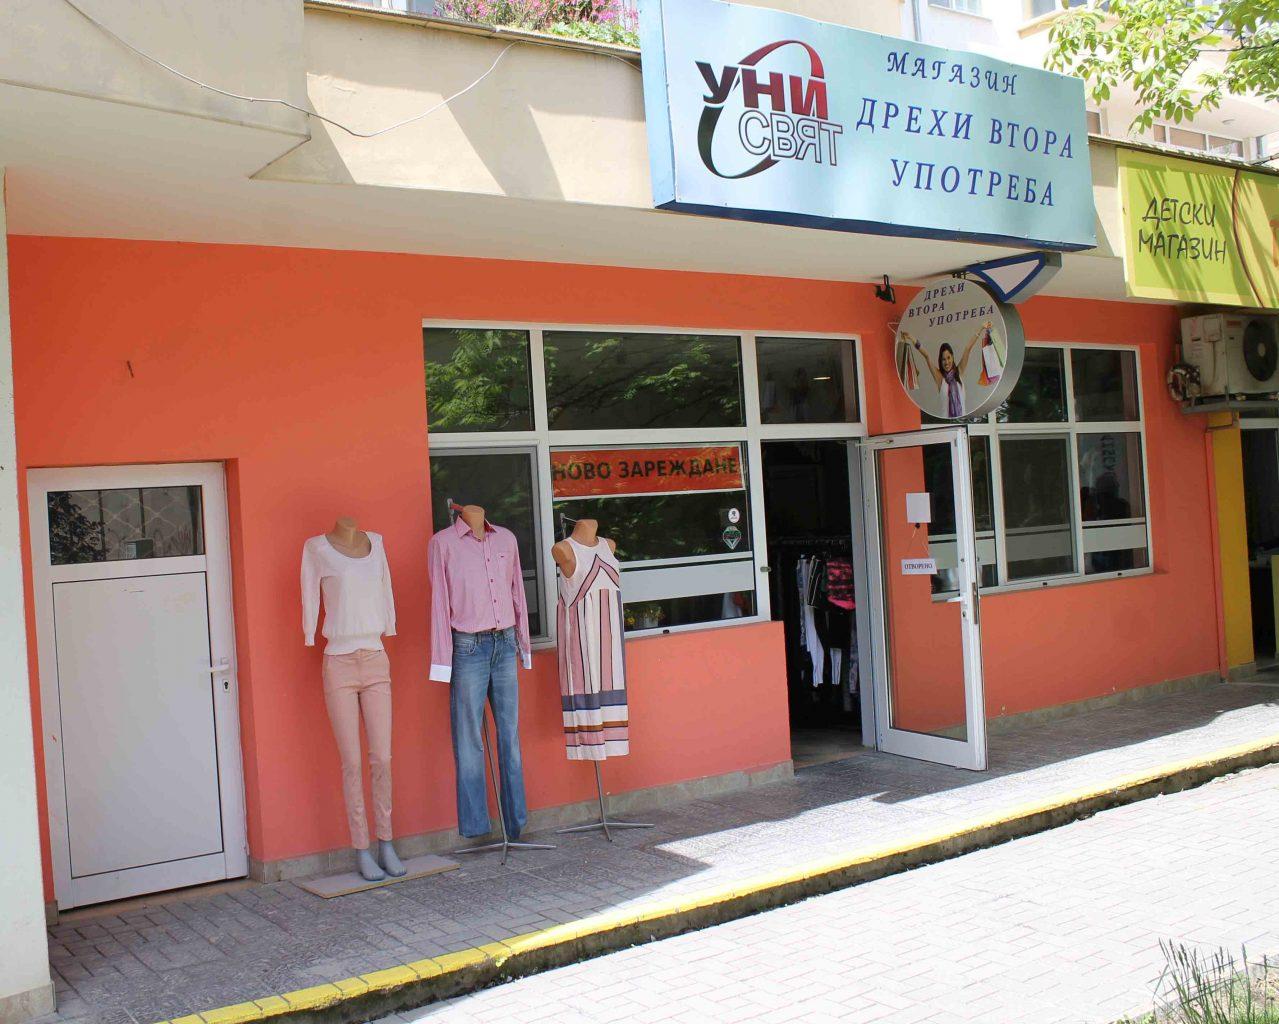 Shop Unisvyat Veliko Tarnovo Bulgaria 2020